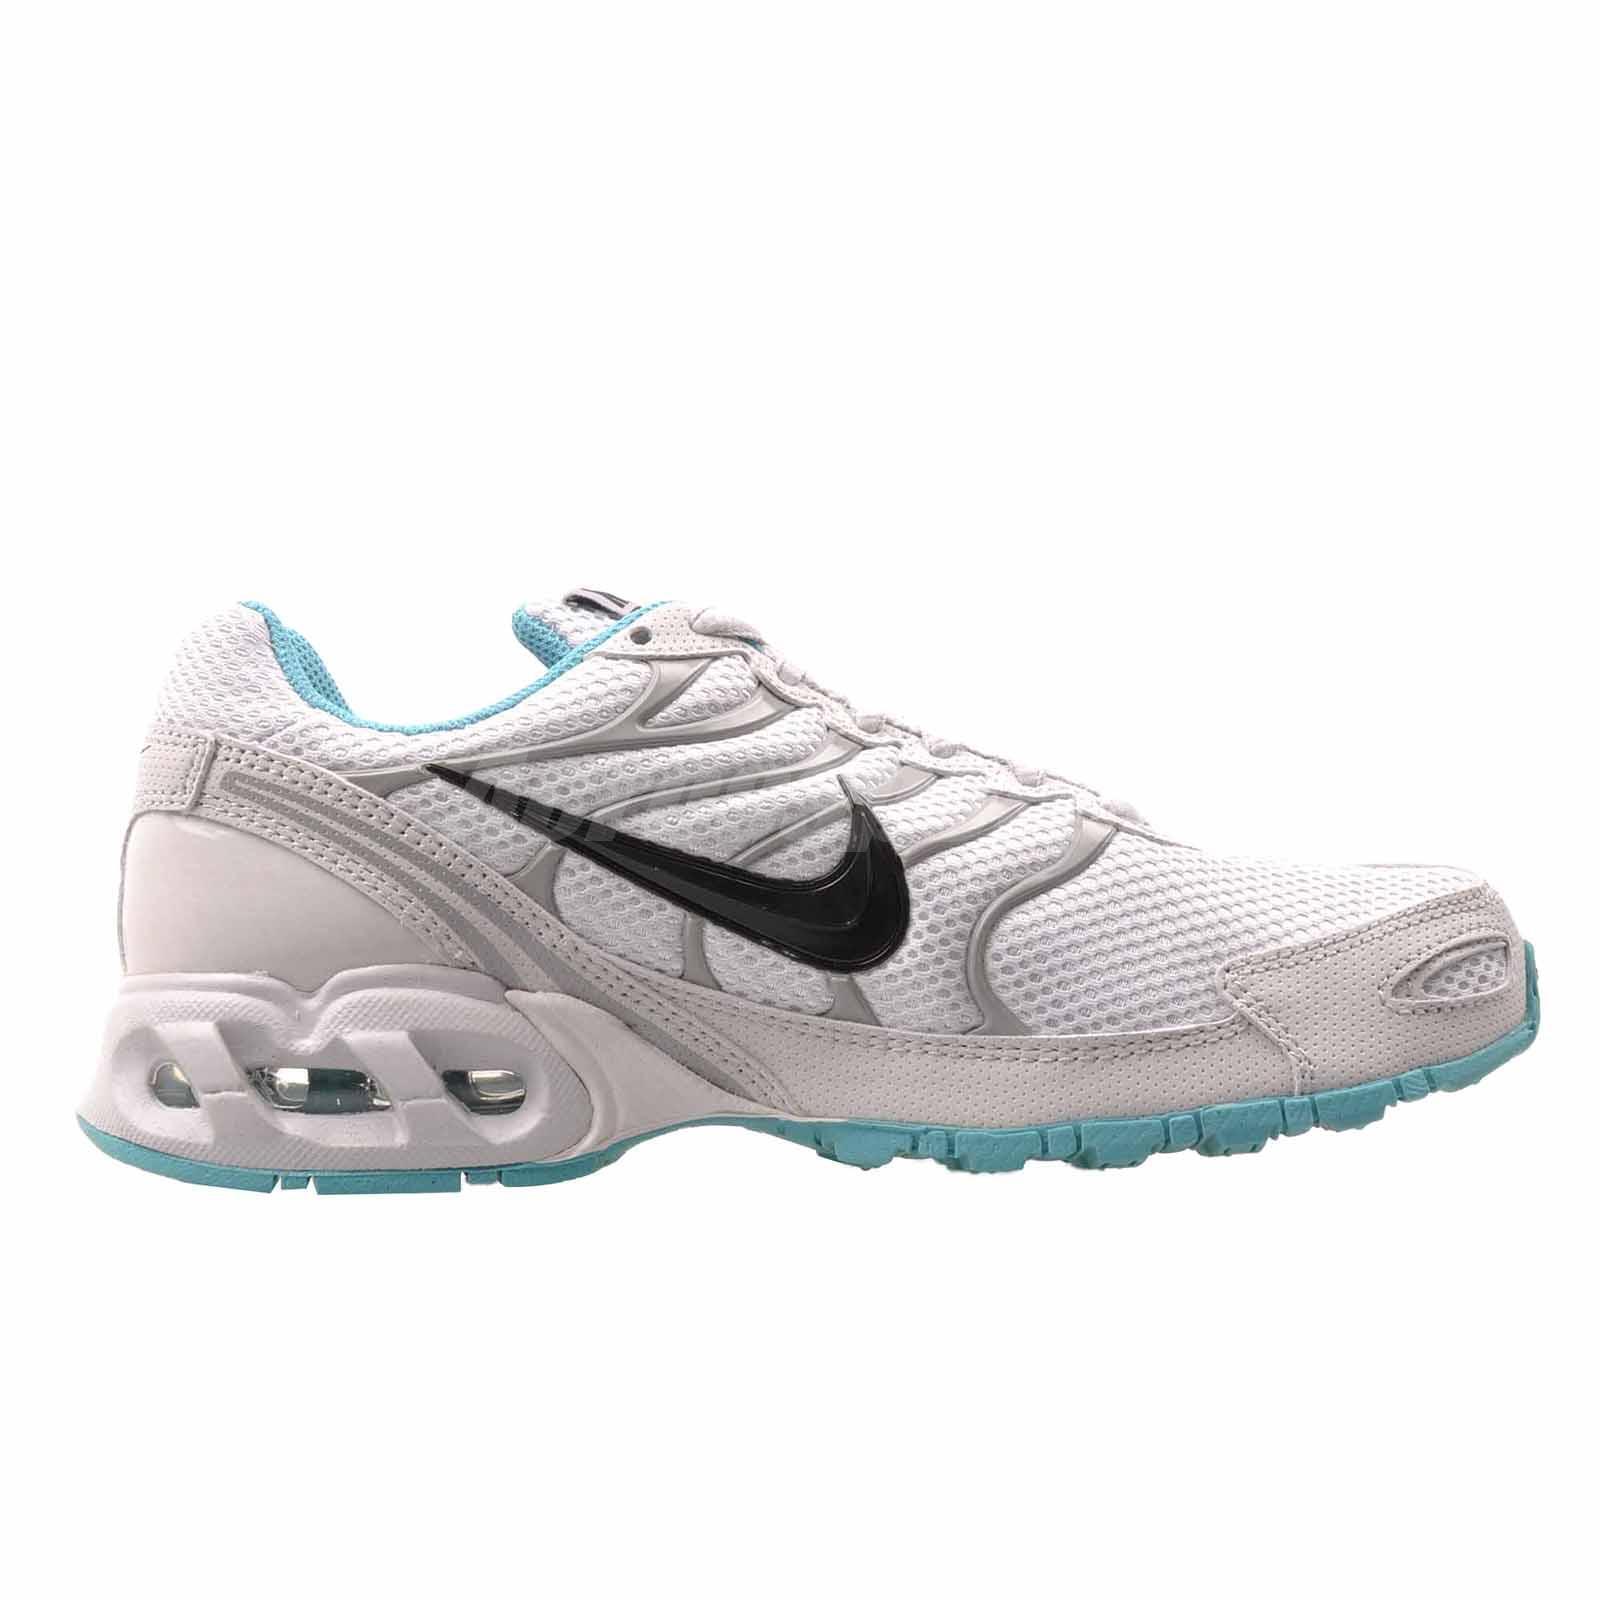 NWT NWT NWT Women's Nike Air Max Torch 4 Running shoes White Turq 343851 009 Wh Black 2bb1c7